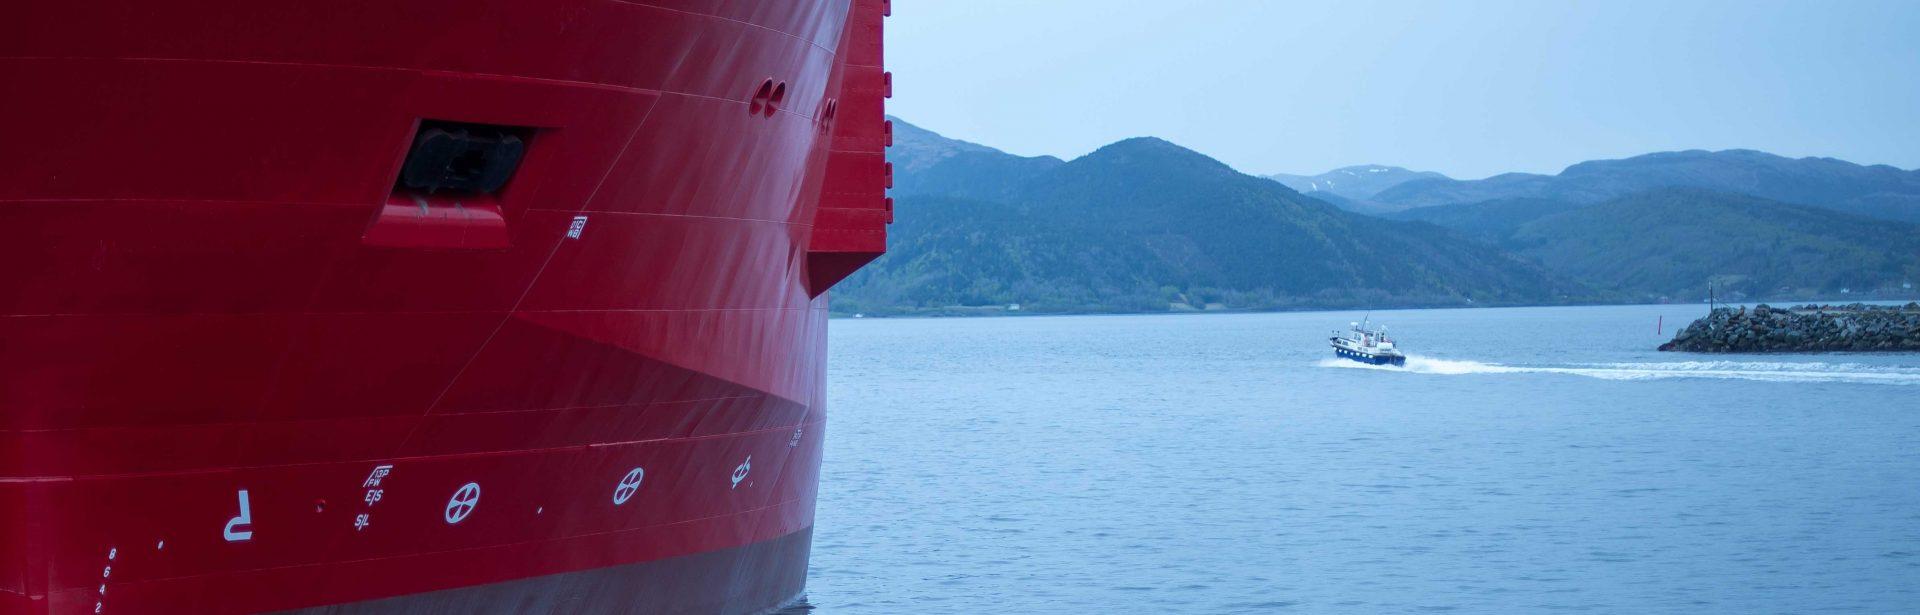 Elpro Maritime